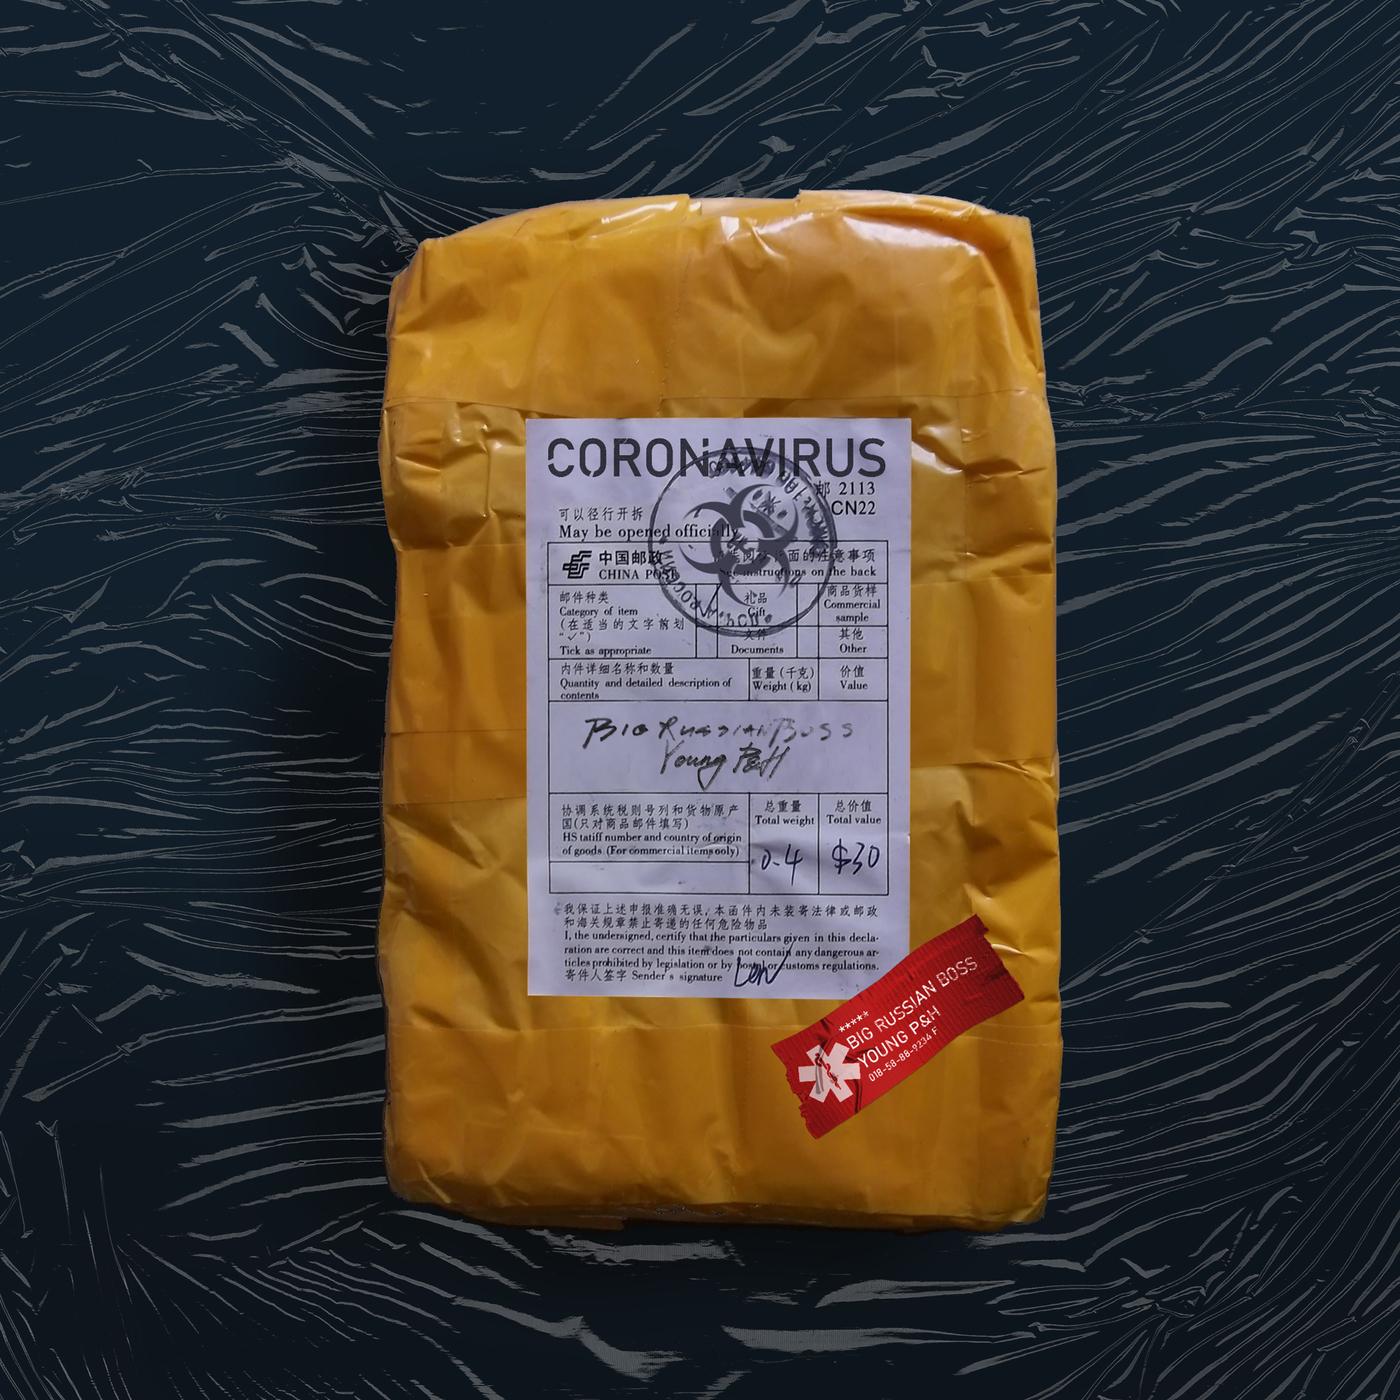 Coronavirus (feat. Young P&H) - BIG RUSSIAN BOSS